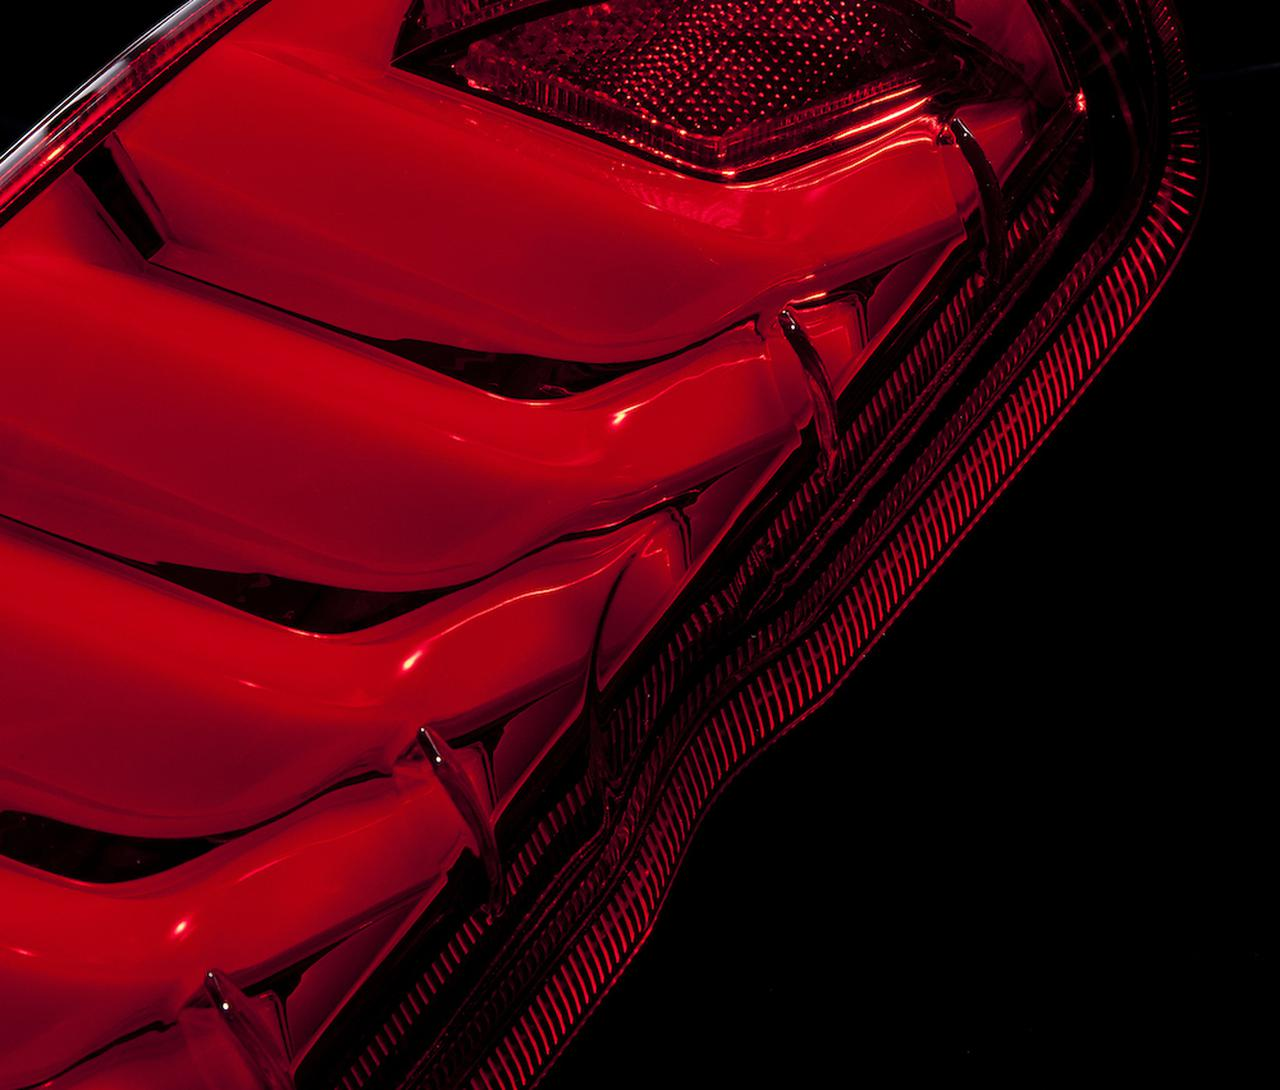 Images : 5番目の画像 - トヨタ ハイエース(200系)用LEDテールランプ - Webモーターマガジン